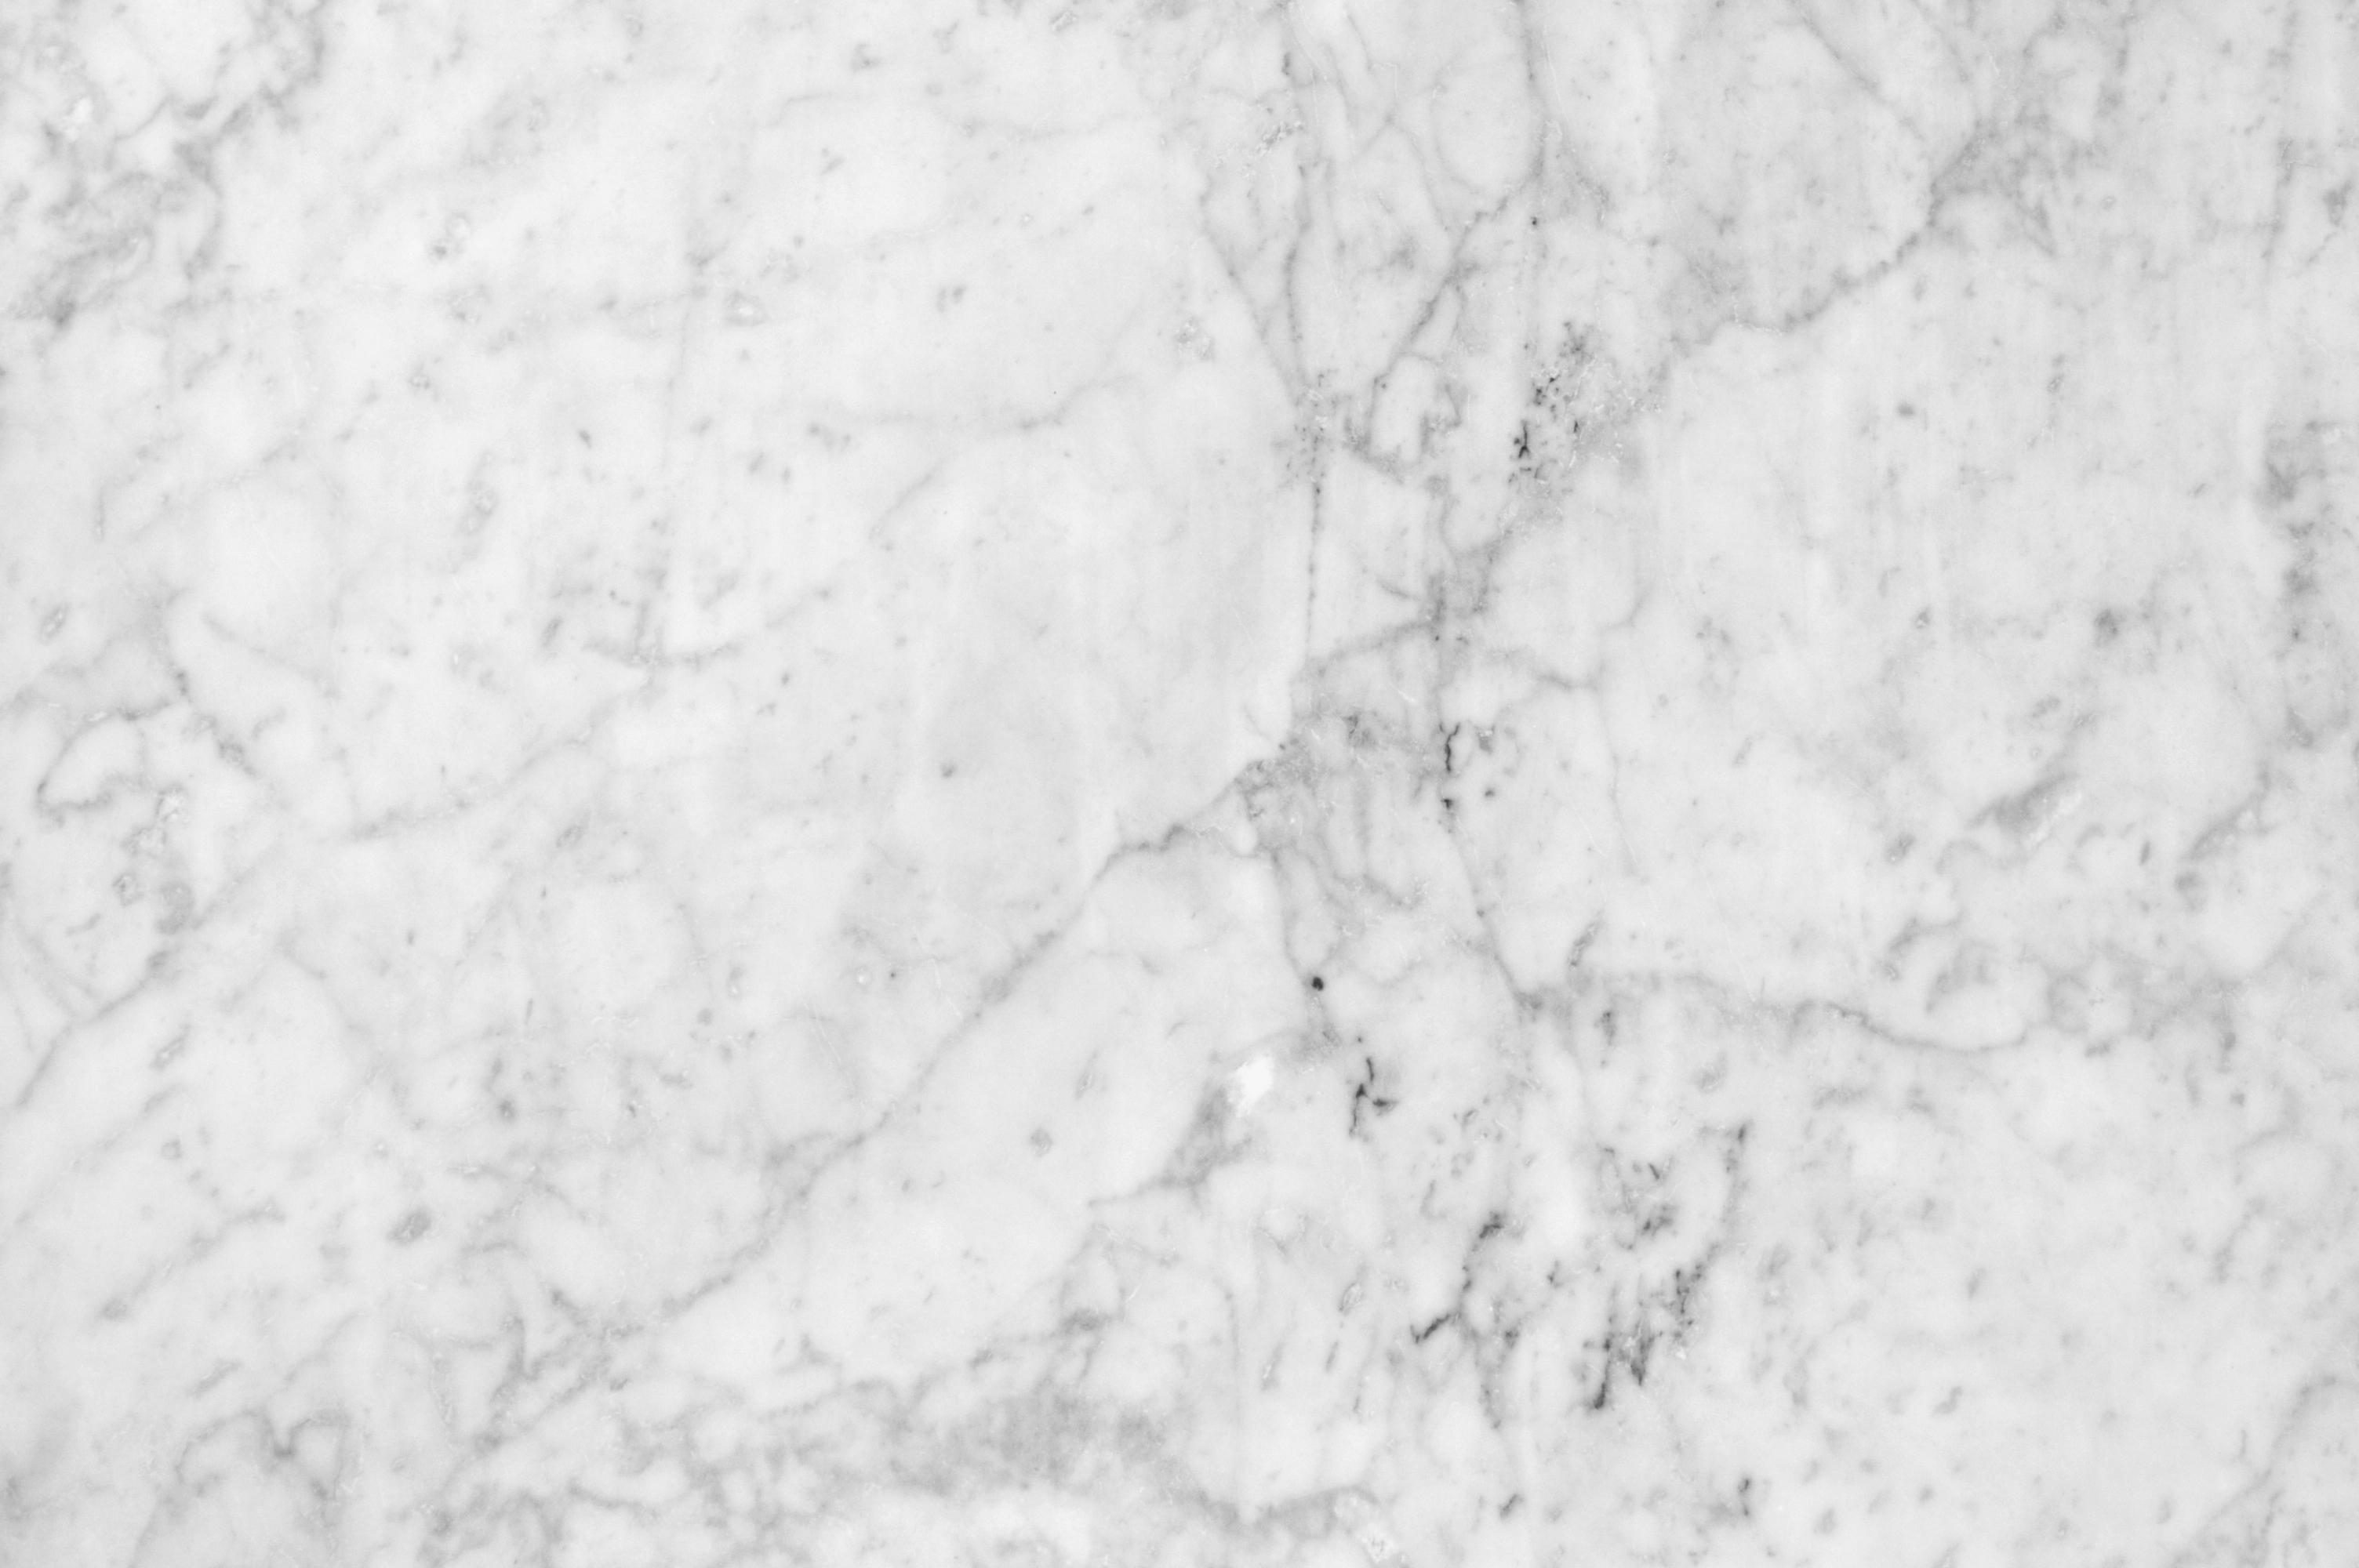 Textures Flat Marble Texture Textures Whitemarble White Marble